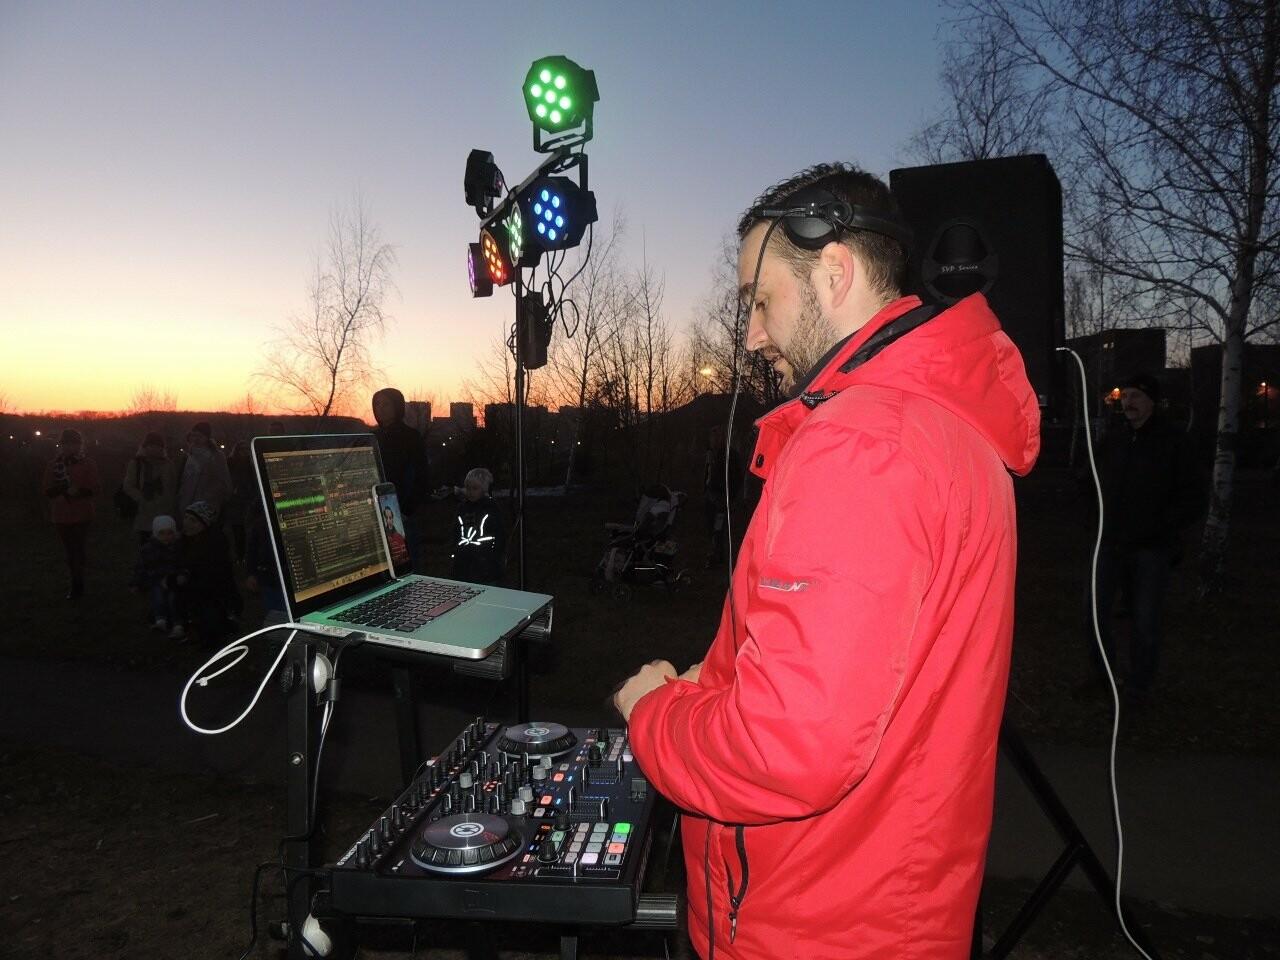 Тамбовчане отметили День космонавтики вместе с порталом Go68 и «Радио Дача», фото-7